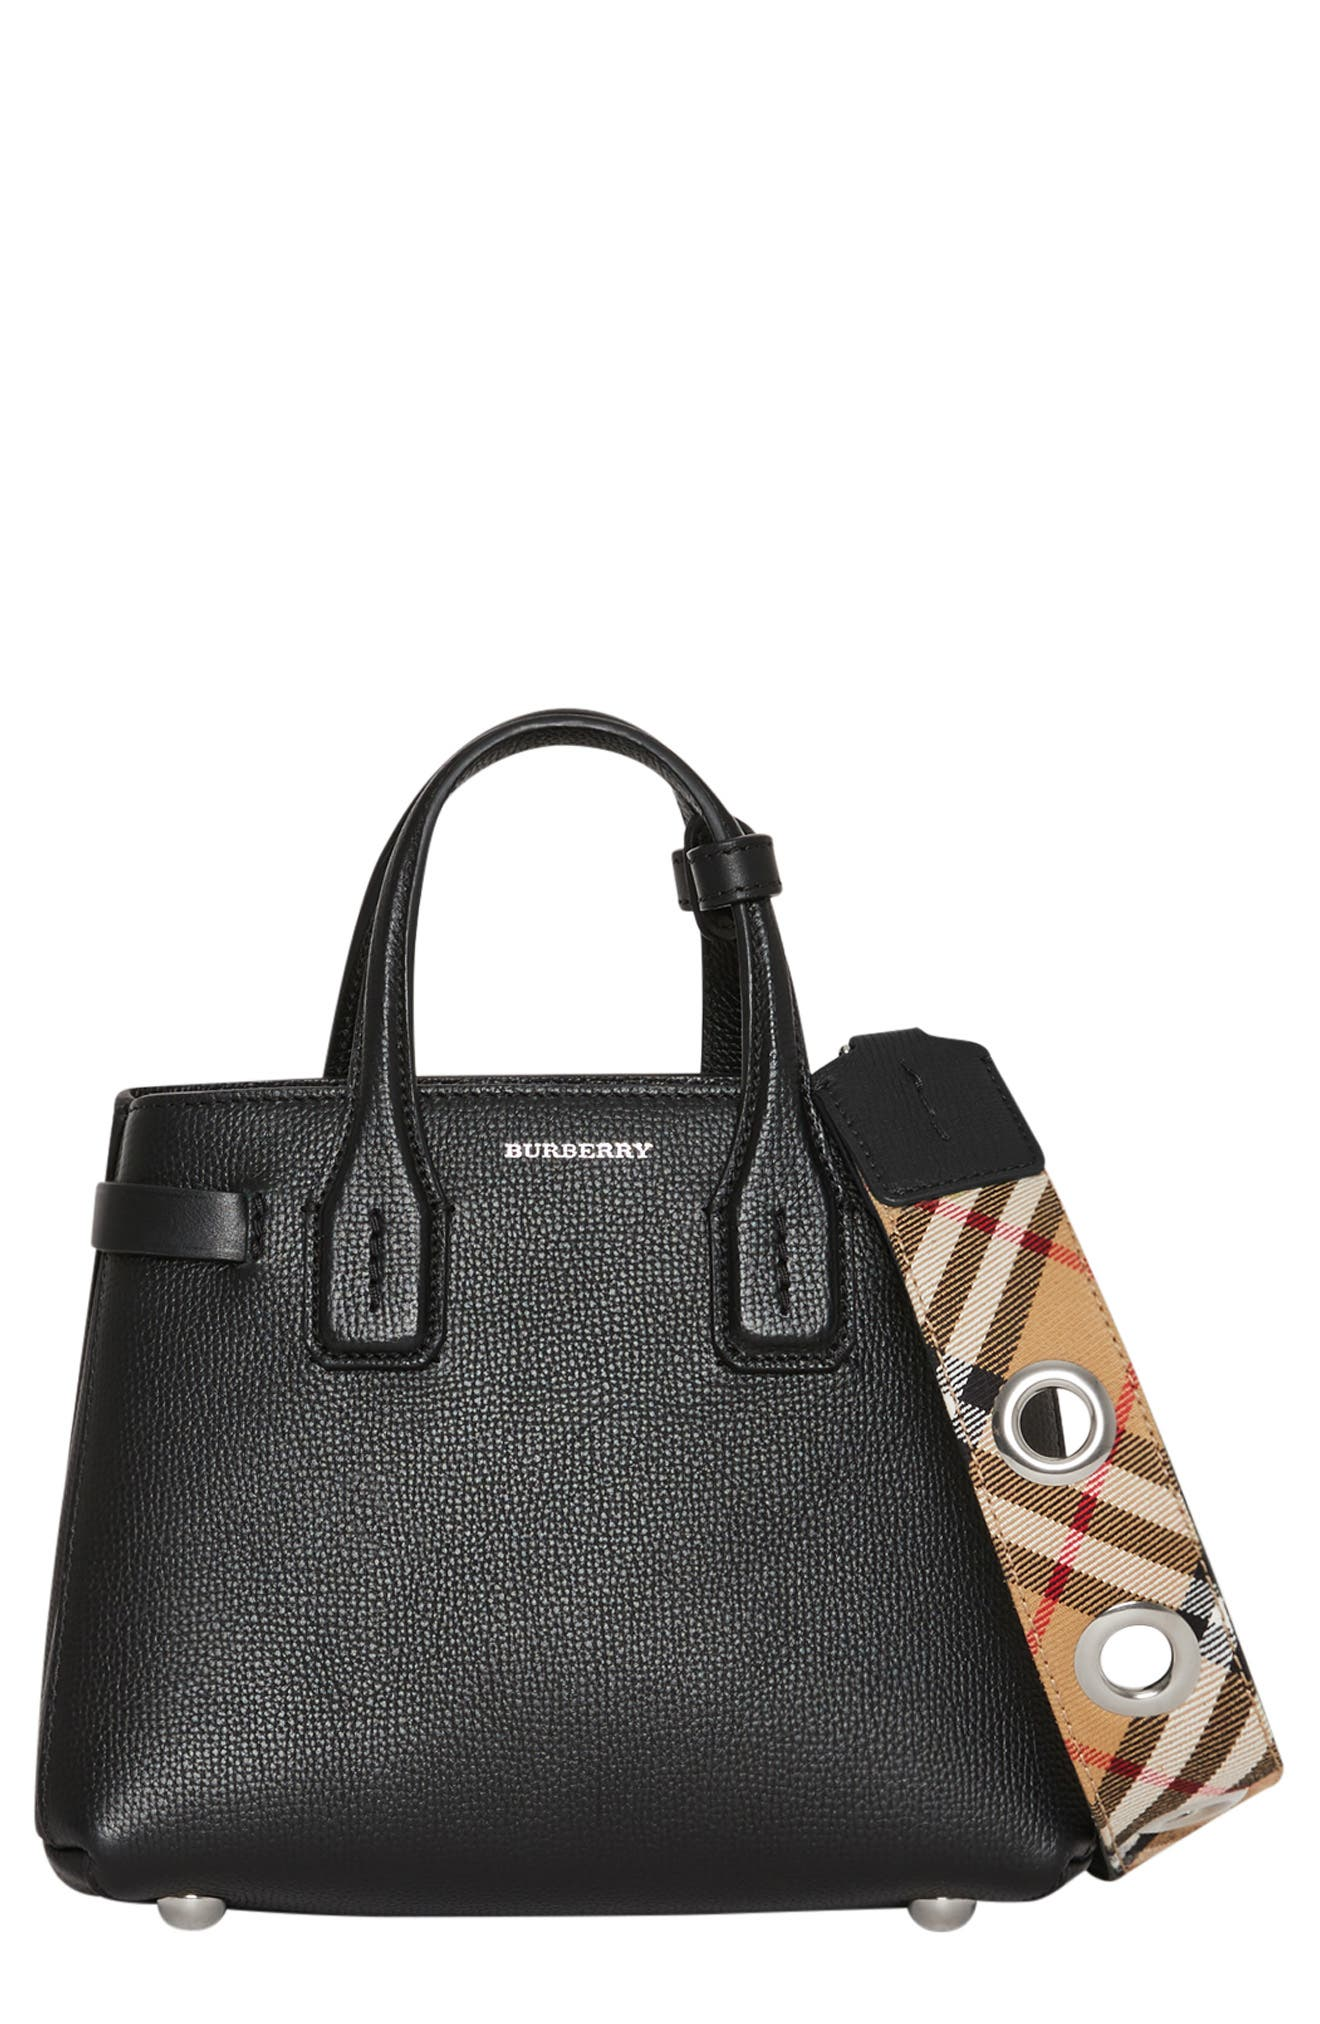 62a323b89ee0 Burberry Crossbody Bags